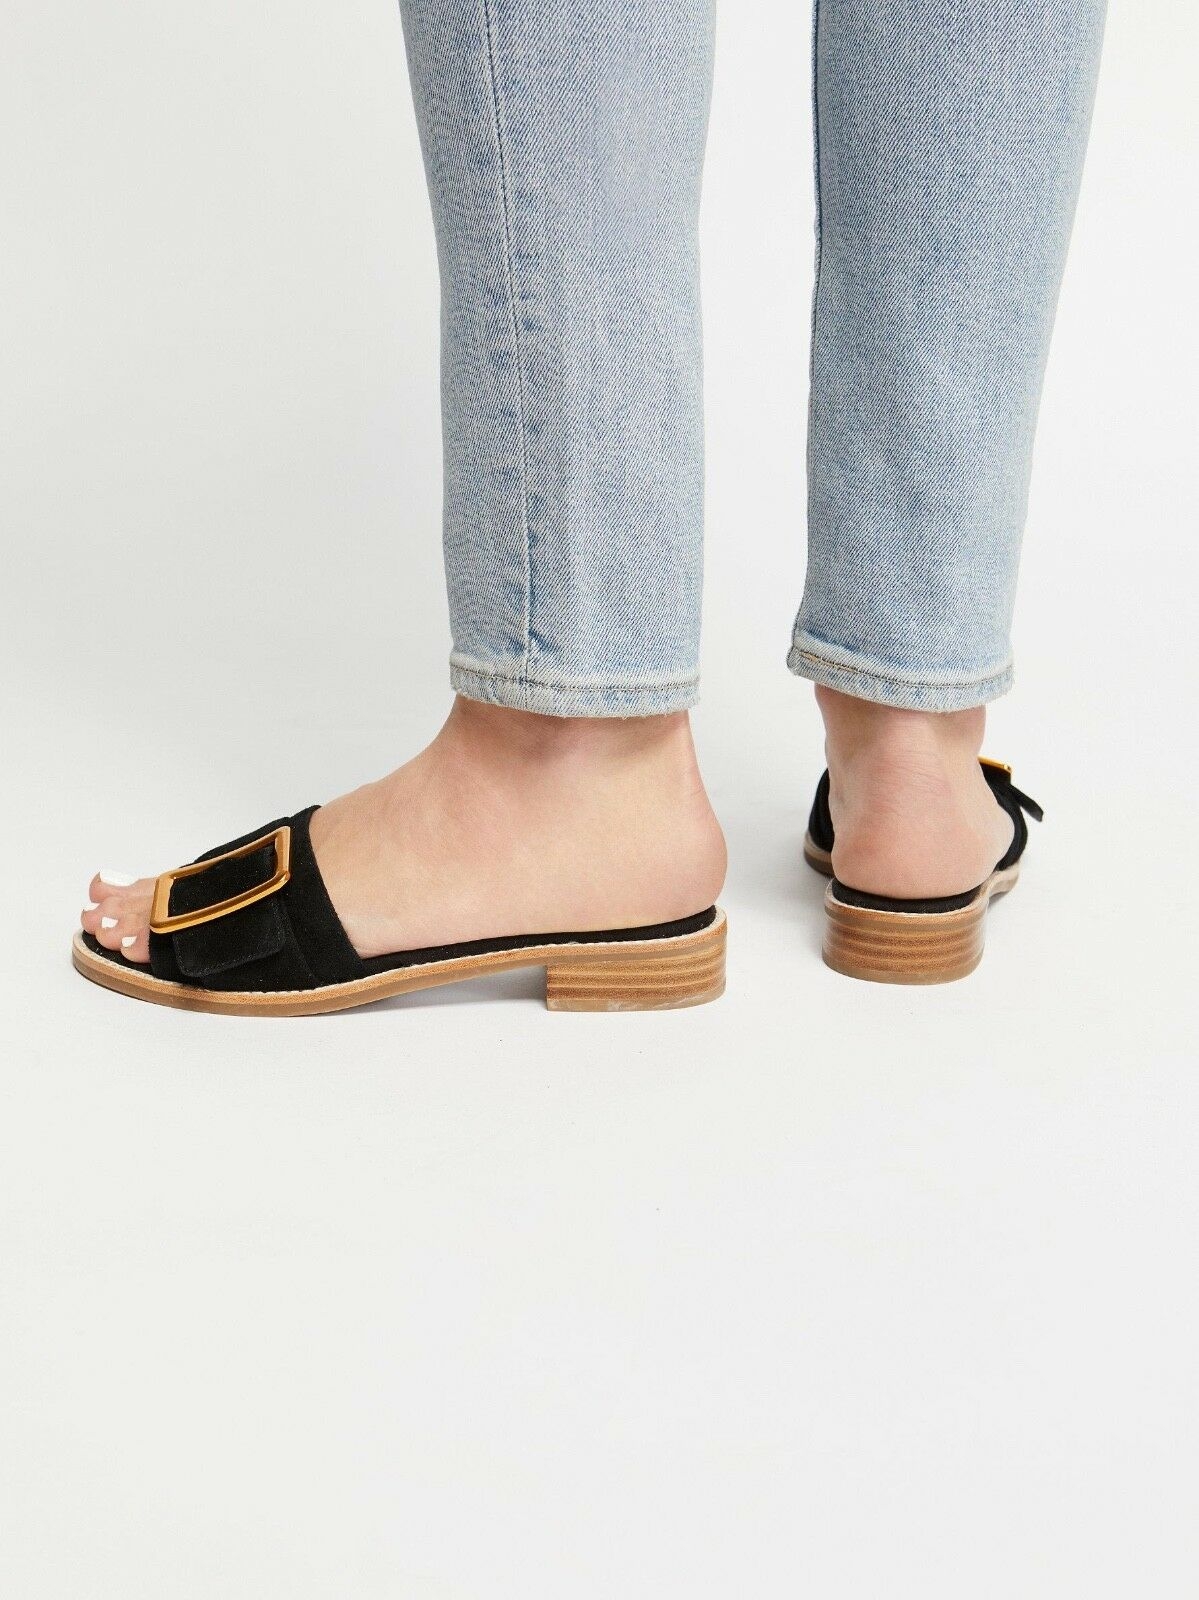 NEW Free People + Jeffrey Campbell Drew Slide Sandal Sandal Sandal size 7.5 MSRP   135 b22731